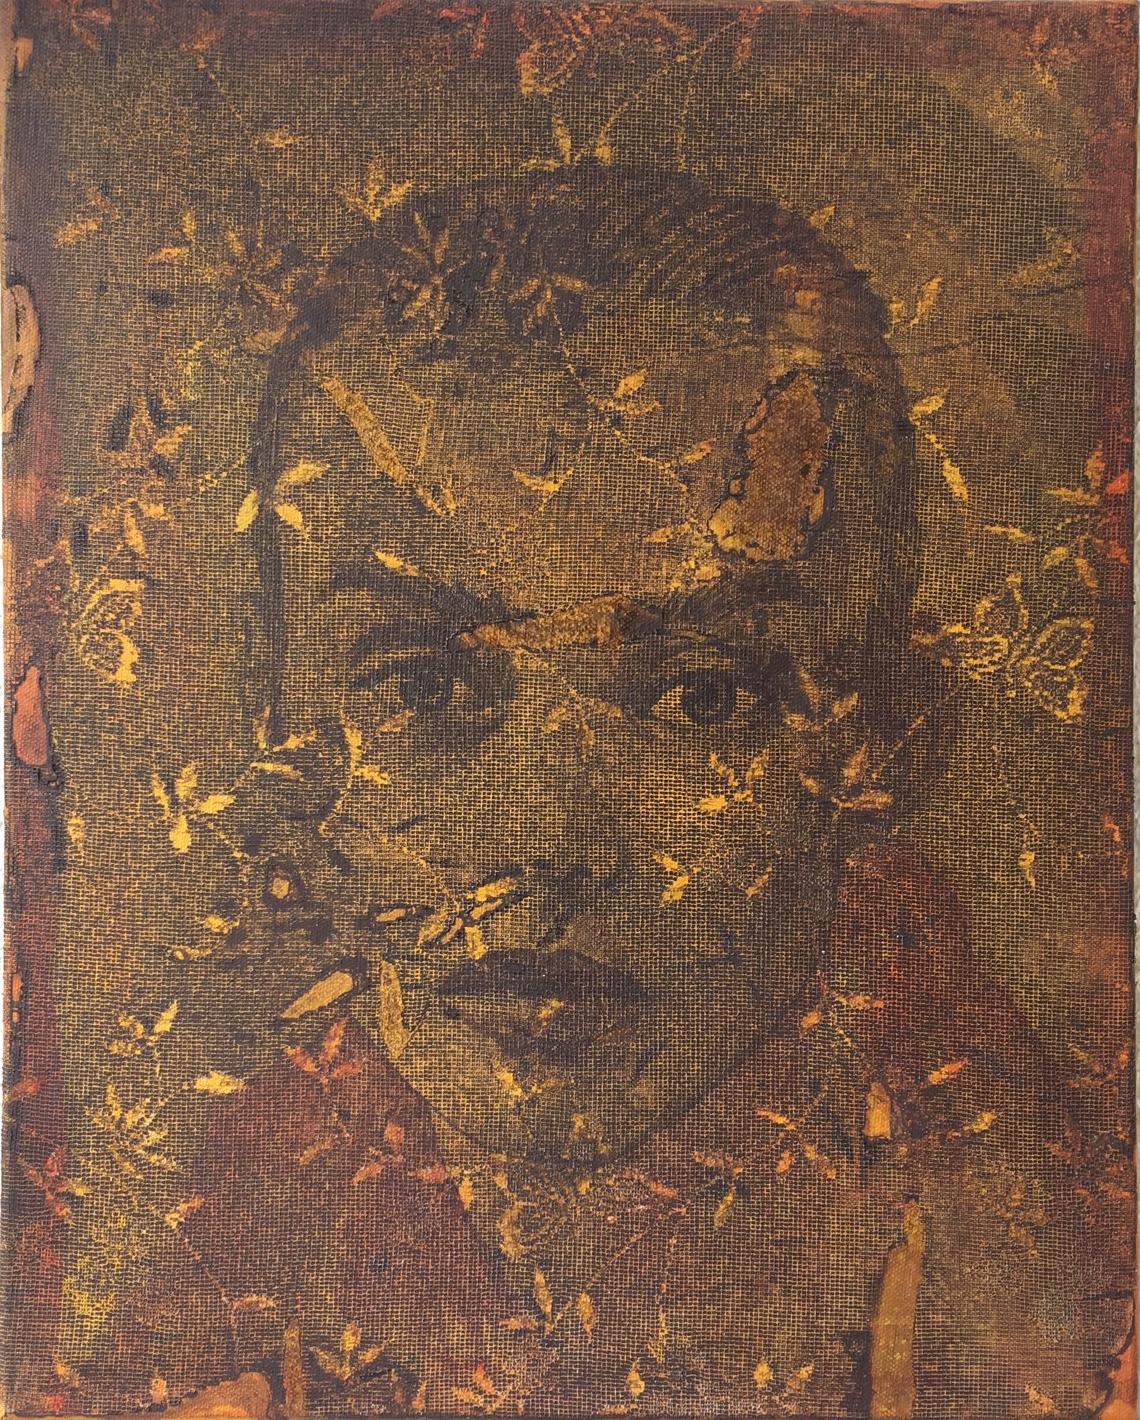 'Enigma of Supermodel', mixed media on canvas, 40cm x 30cm,